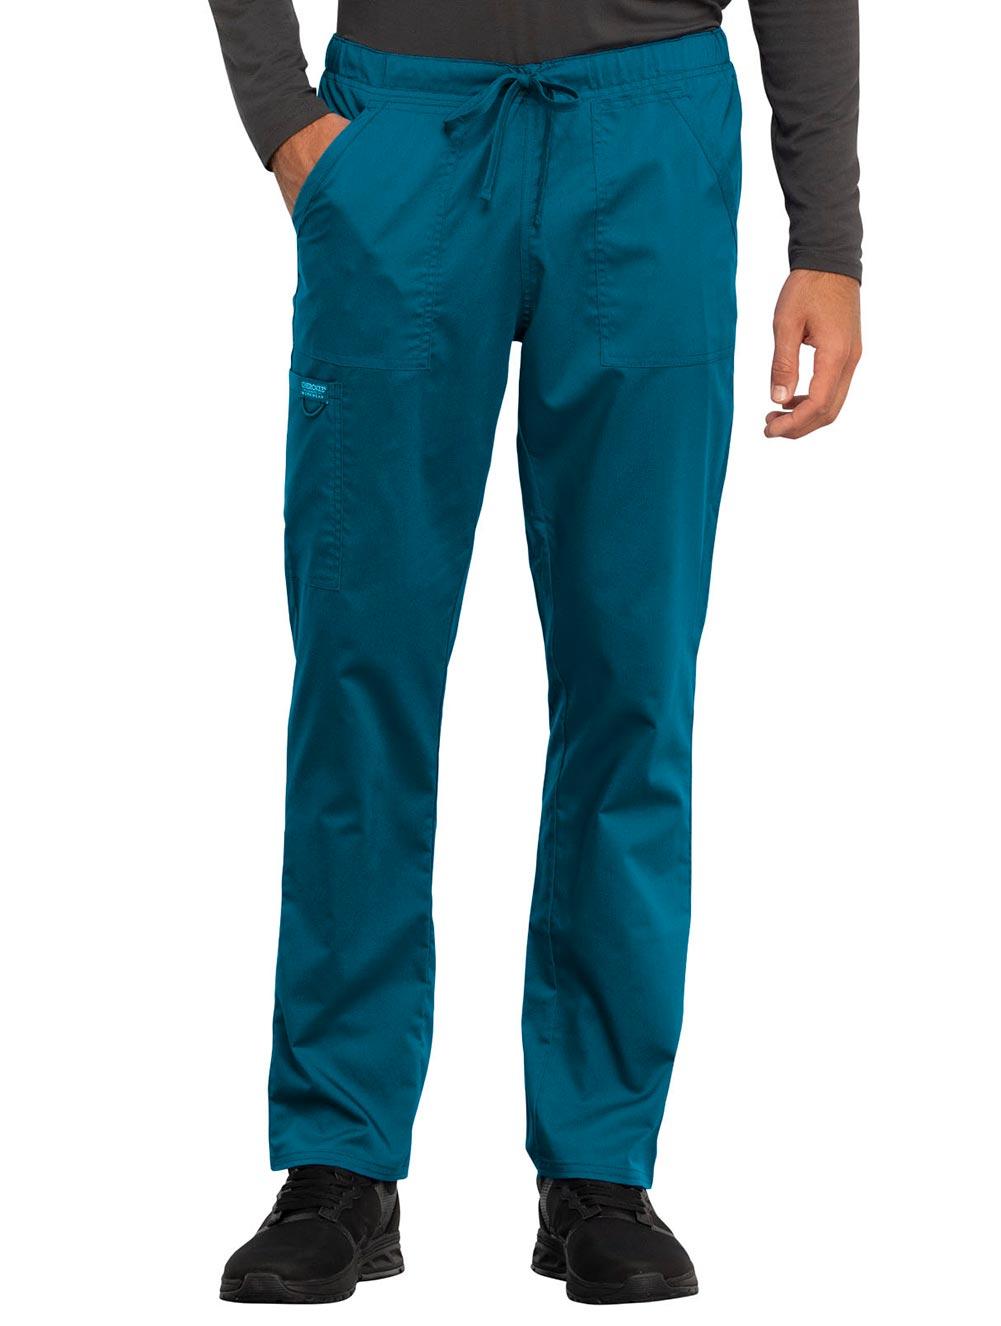 Unisex Tapered Leg Drawstring Pant